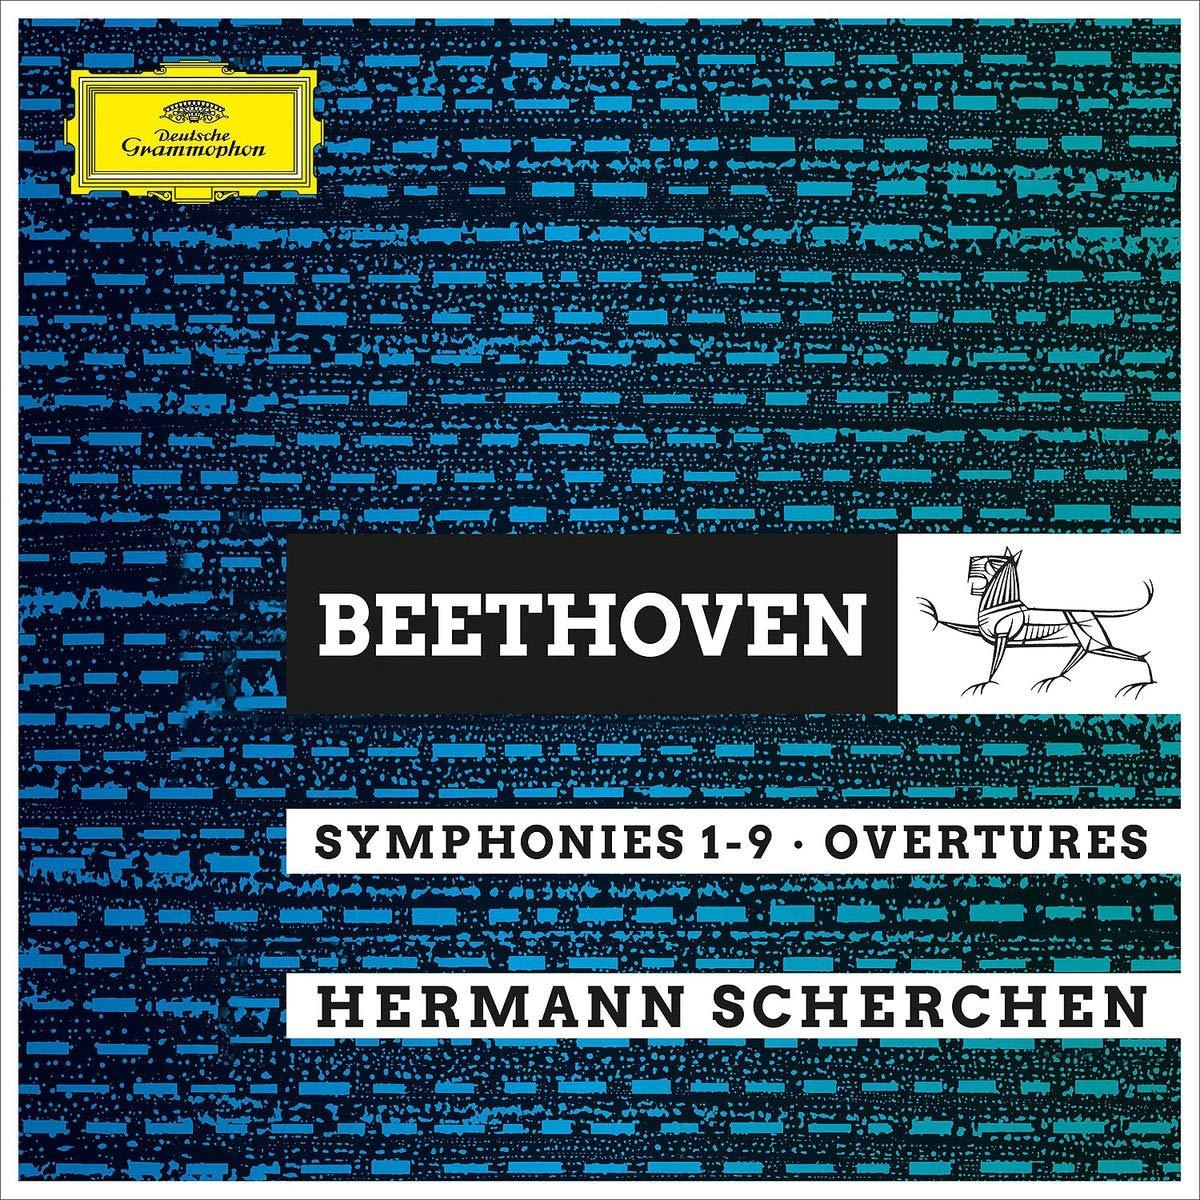 Beethoven Symphonies 1-9, Overtures